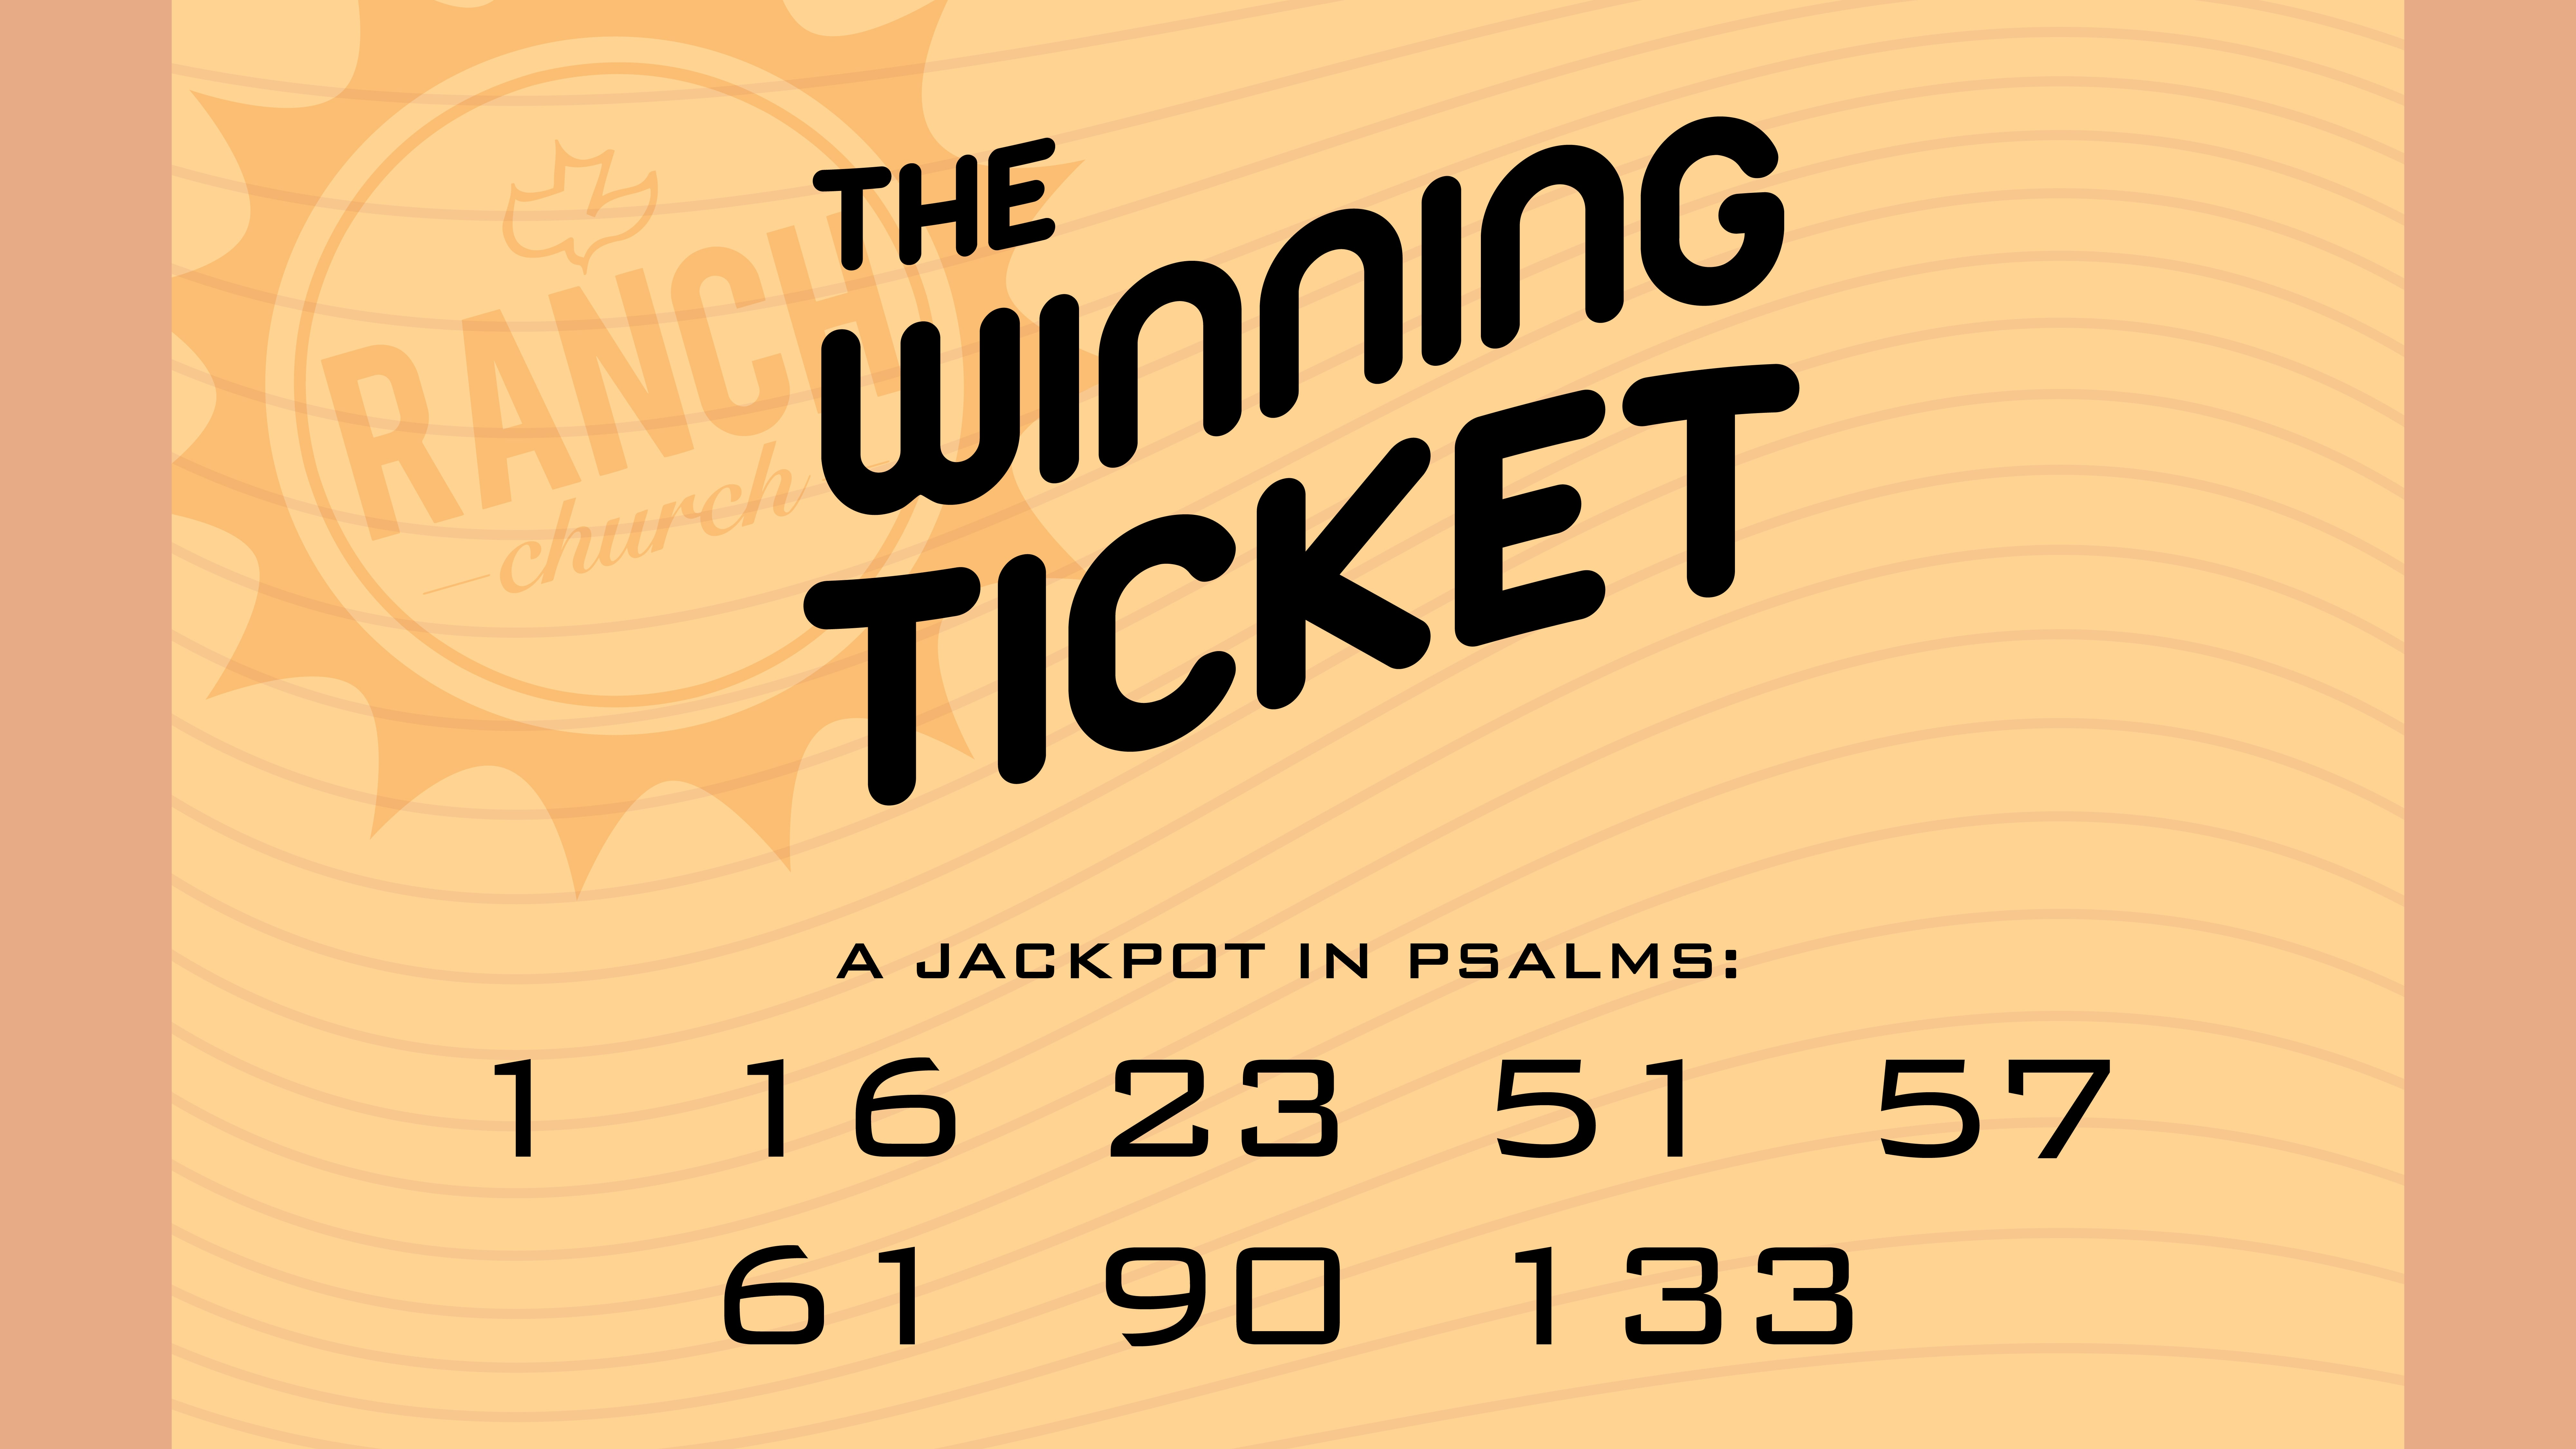 The Winning Ticket: How God's Favor Works Image